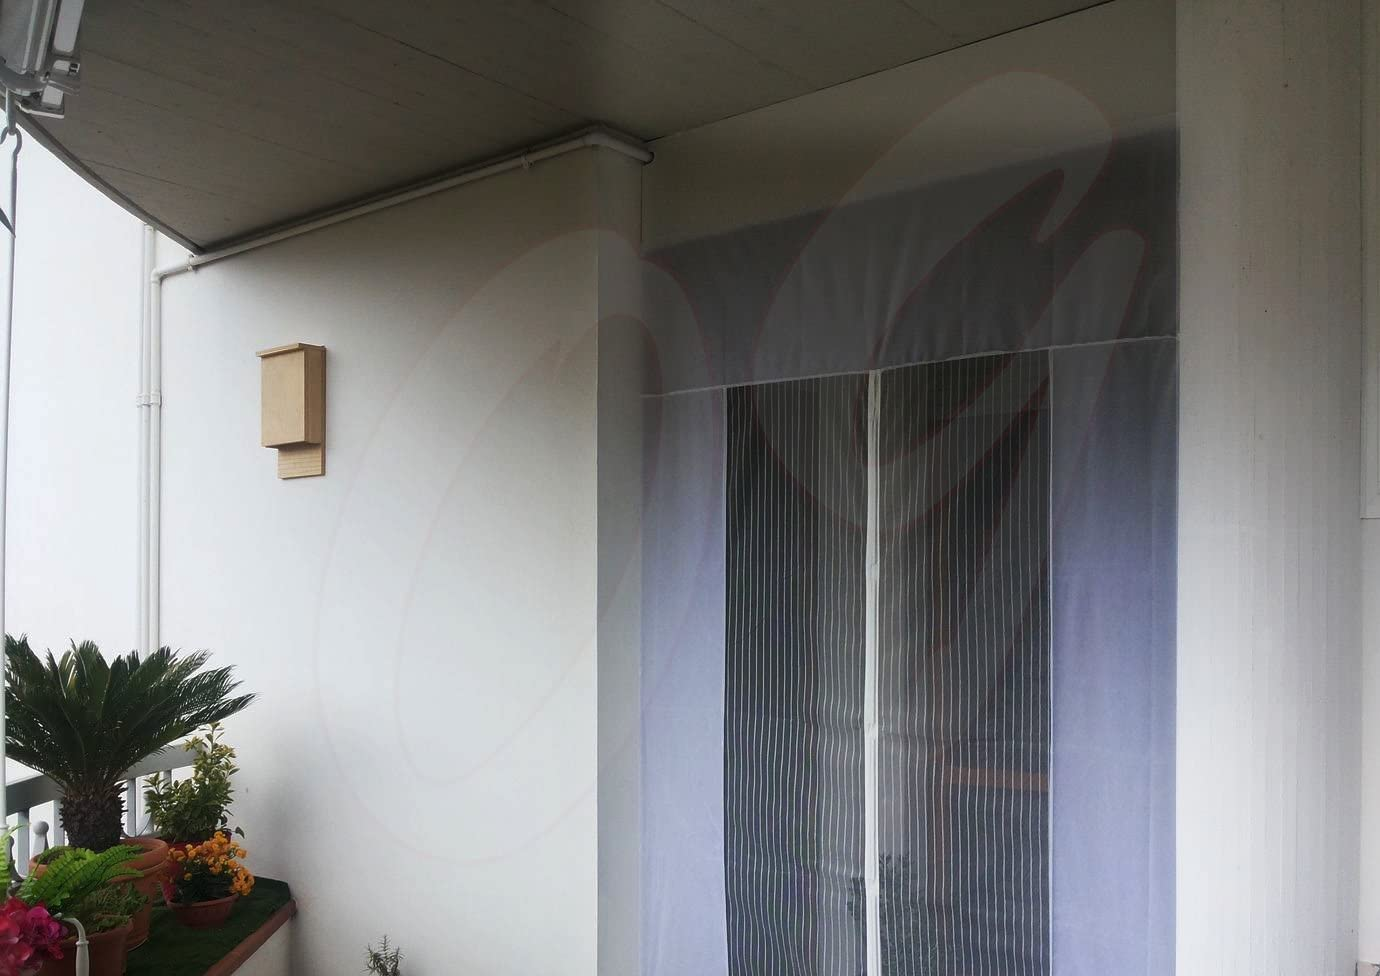 AMCER Zanzariera Magnetica 100x260cm Bianco Tende per Porte Francesi di Maglia Rete Tenda in Vetroresina